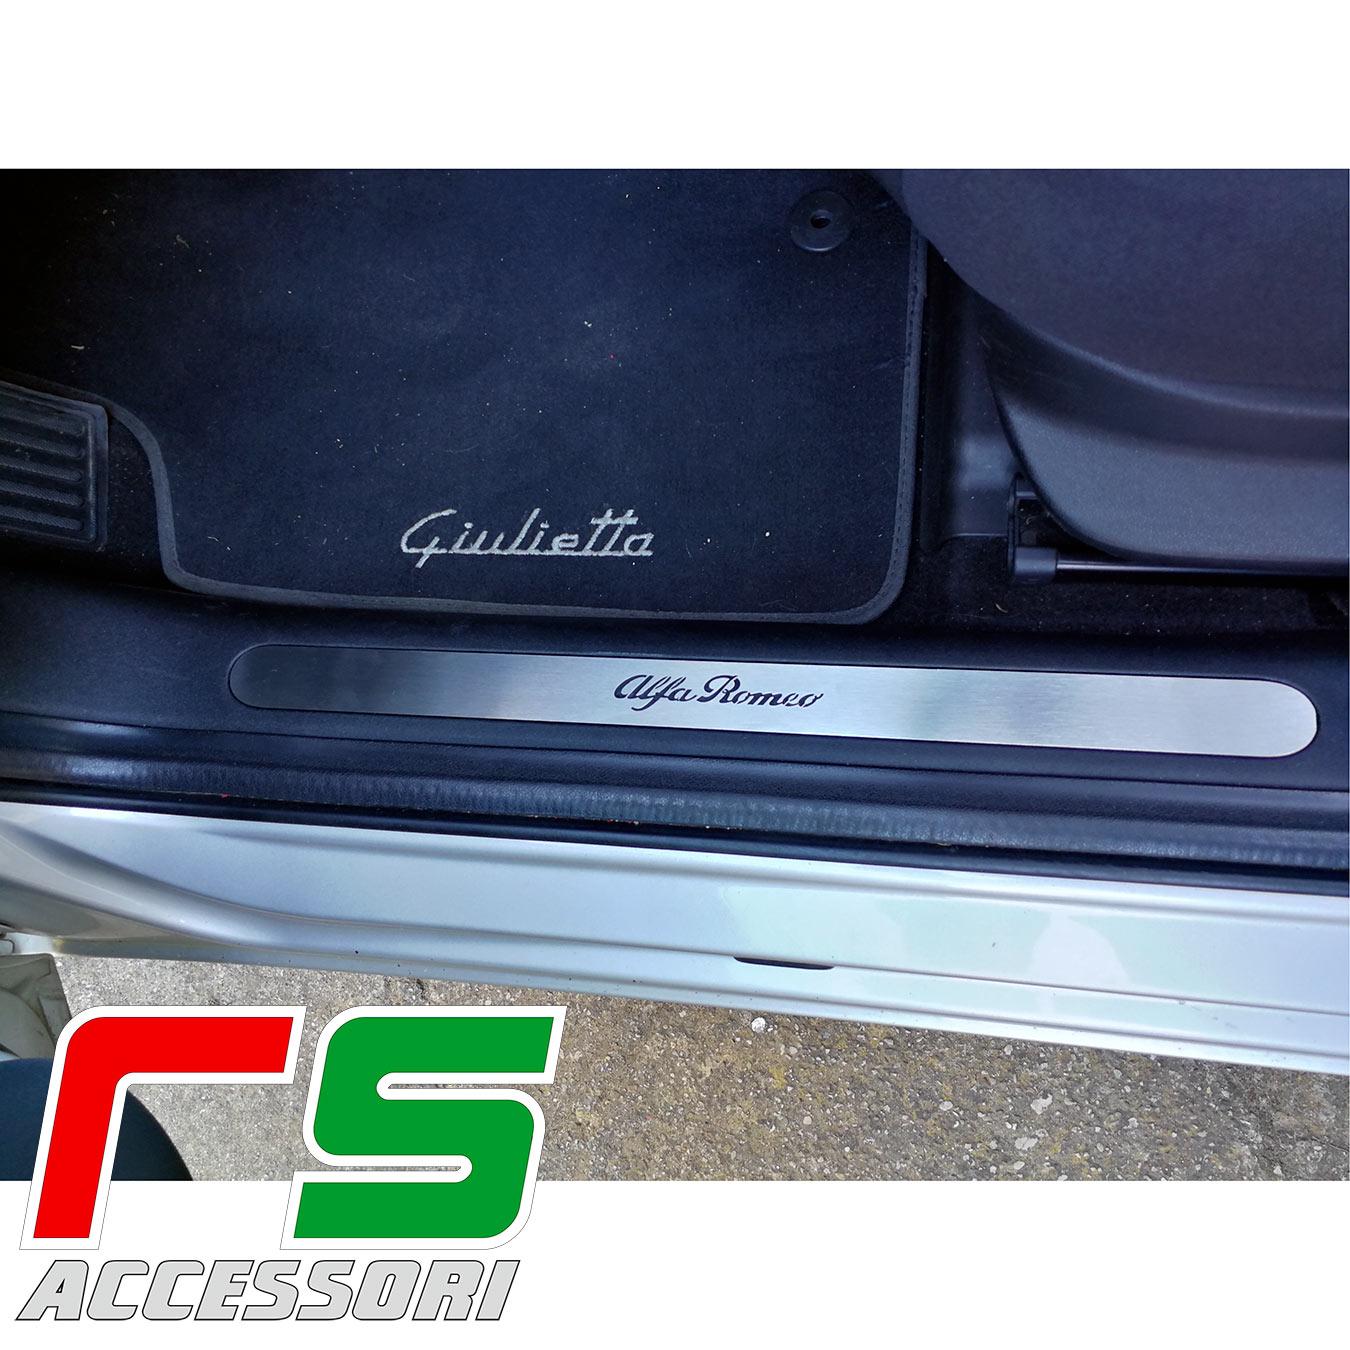 butée de seuil Alfa Romeo Giulietta plate-forme sous-marine en acier inoxydable